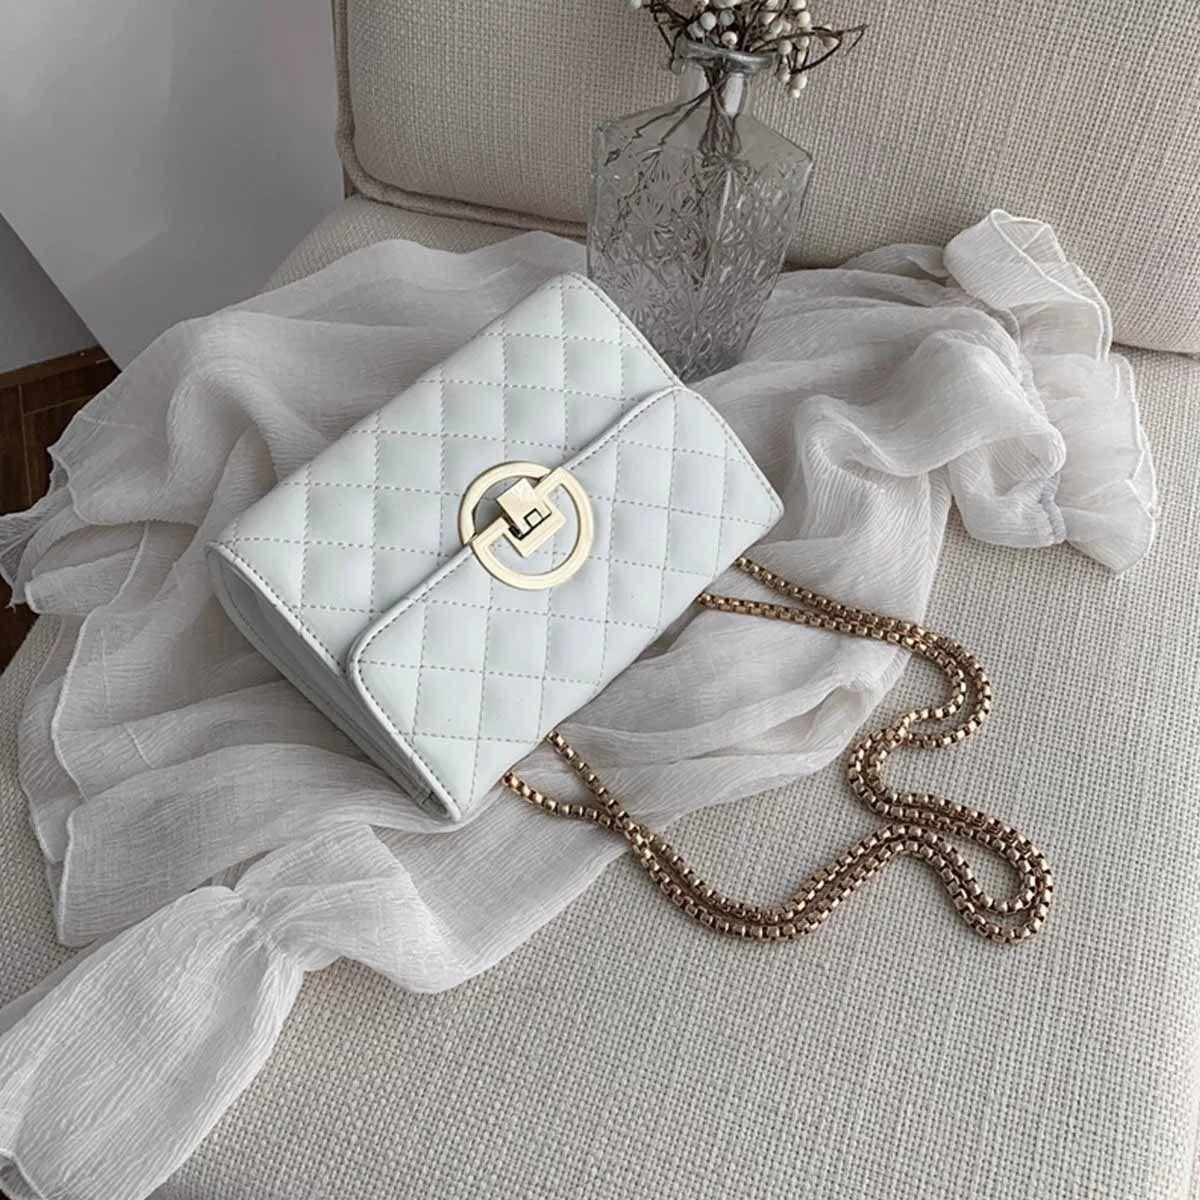 Bolsa en relieve Claza de Clamshell Caja de moda diagonal tridimensional para mujer Golden Classic Lock Bolso Moda con tcjuk qgbif